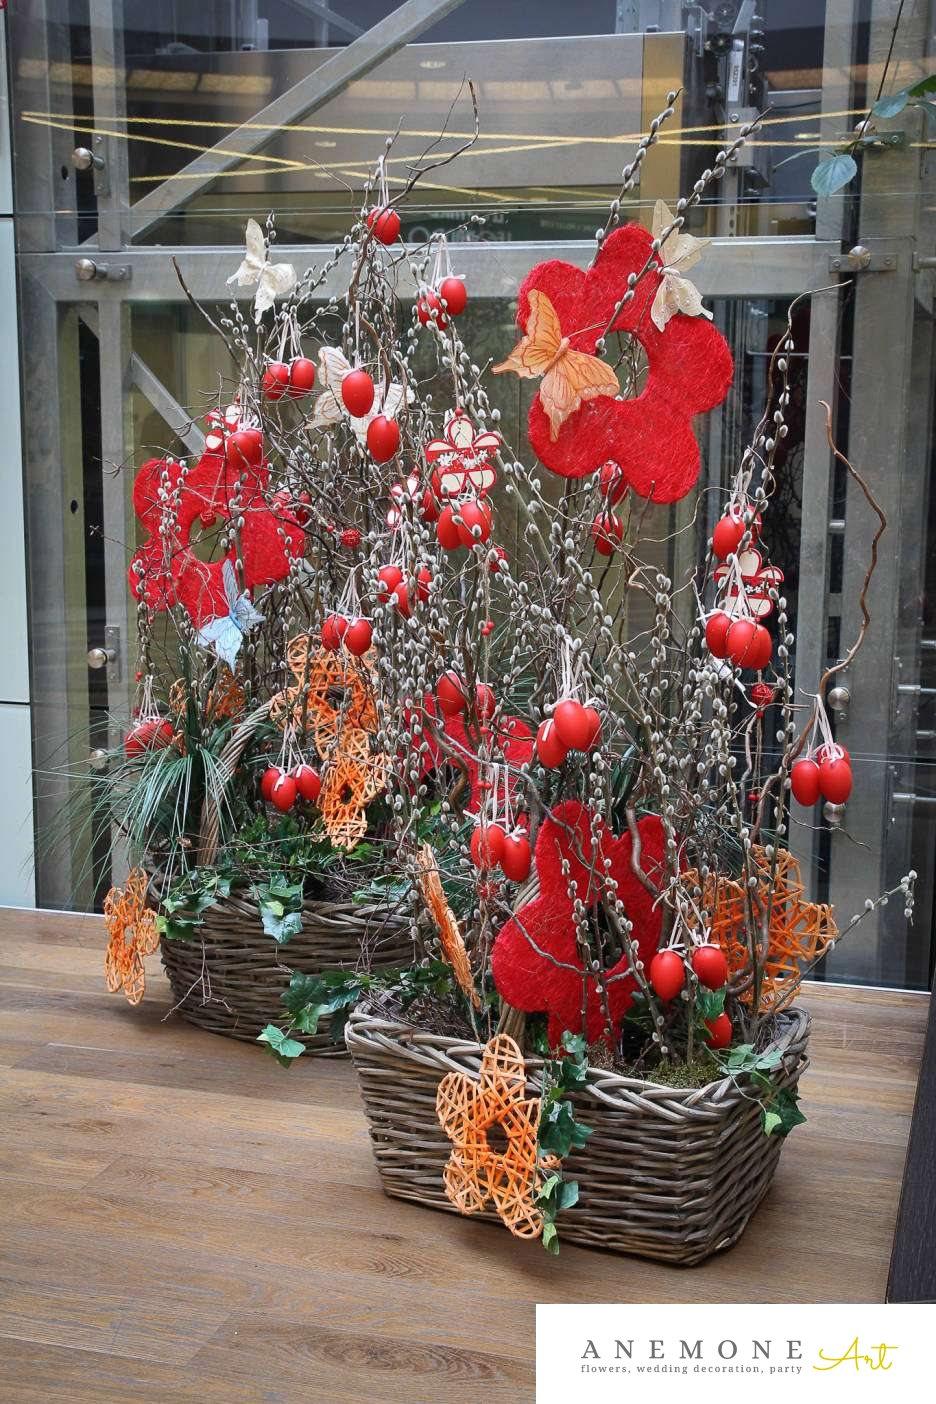 Poza, foto cu Flori de nunta decor tematic in Arad, Timisoara, Oradea (wedding flowers, bouquets) nunta Arad, Timisoara, Oradea